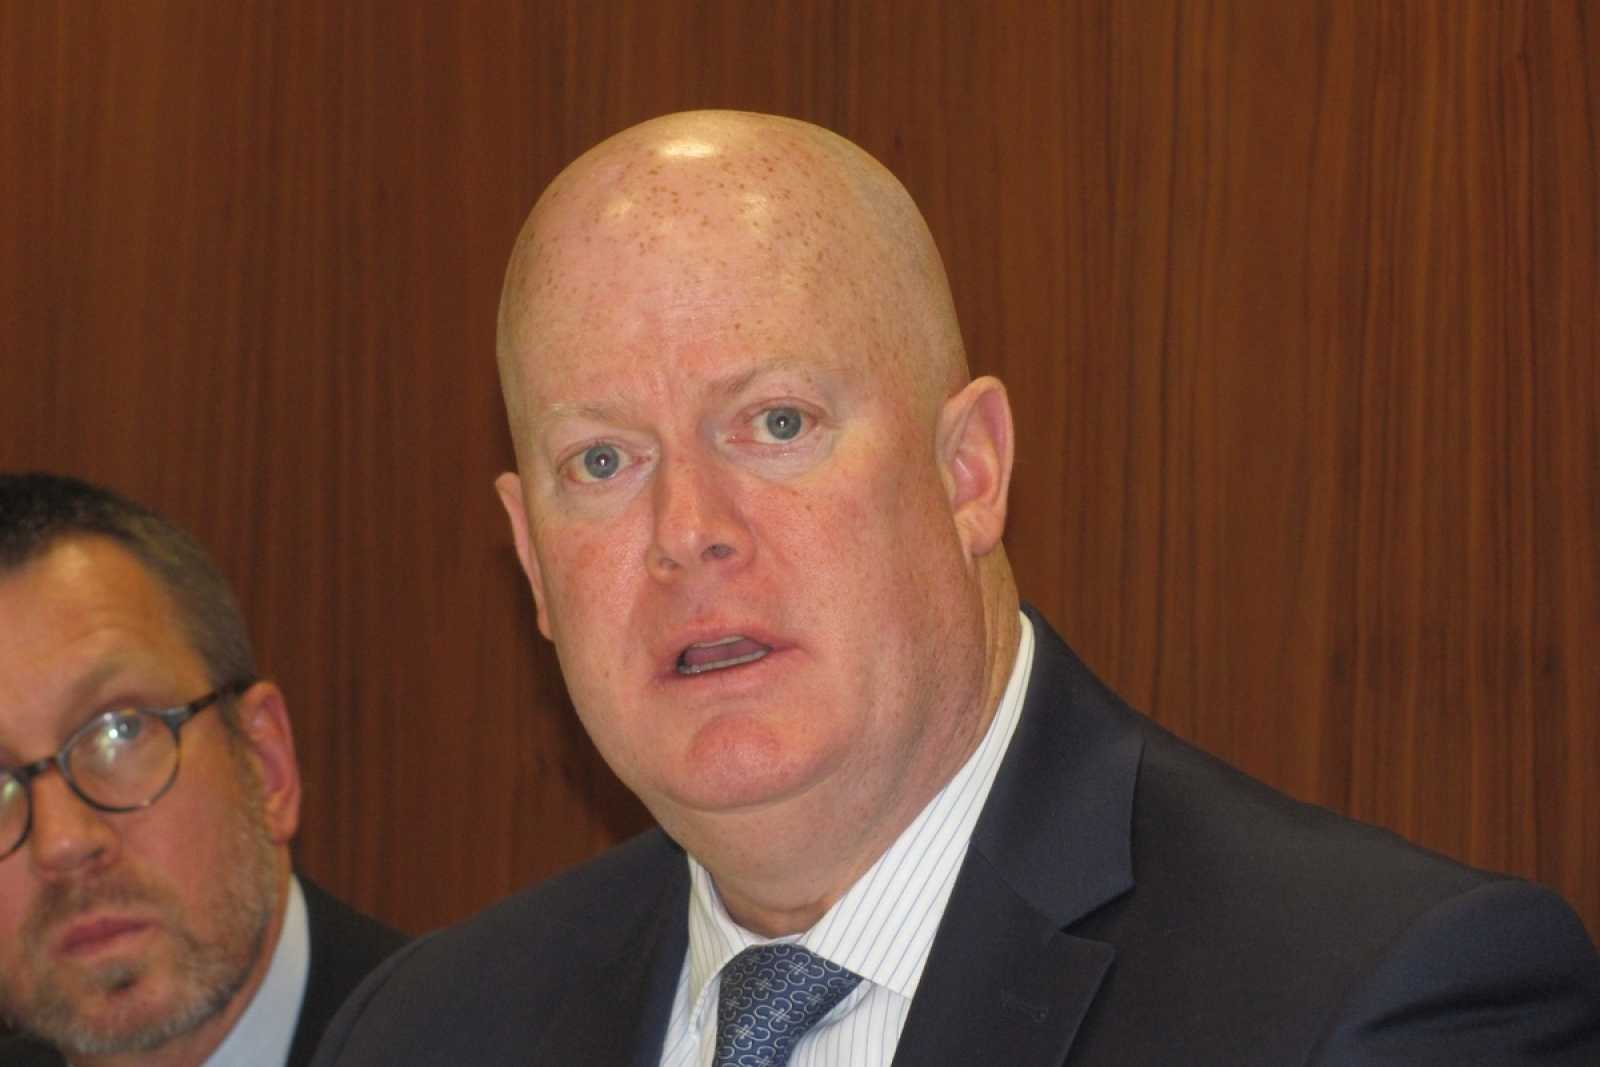 Sean Dalton chair of IUM Is Cargo Committee GPG Pic at IUMI Press conf 11 2 20